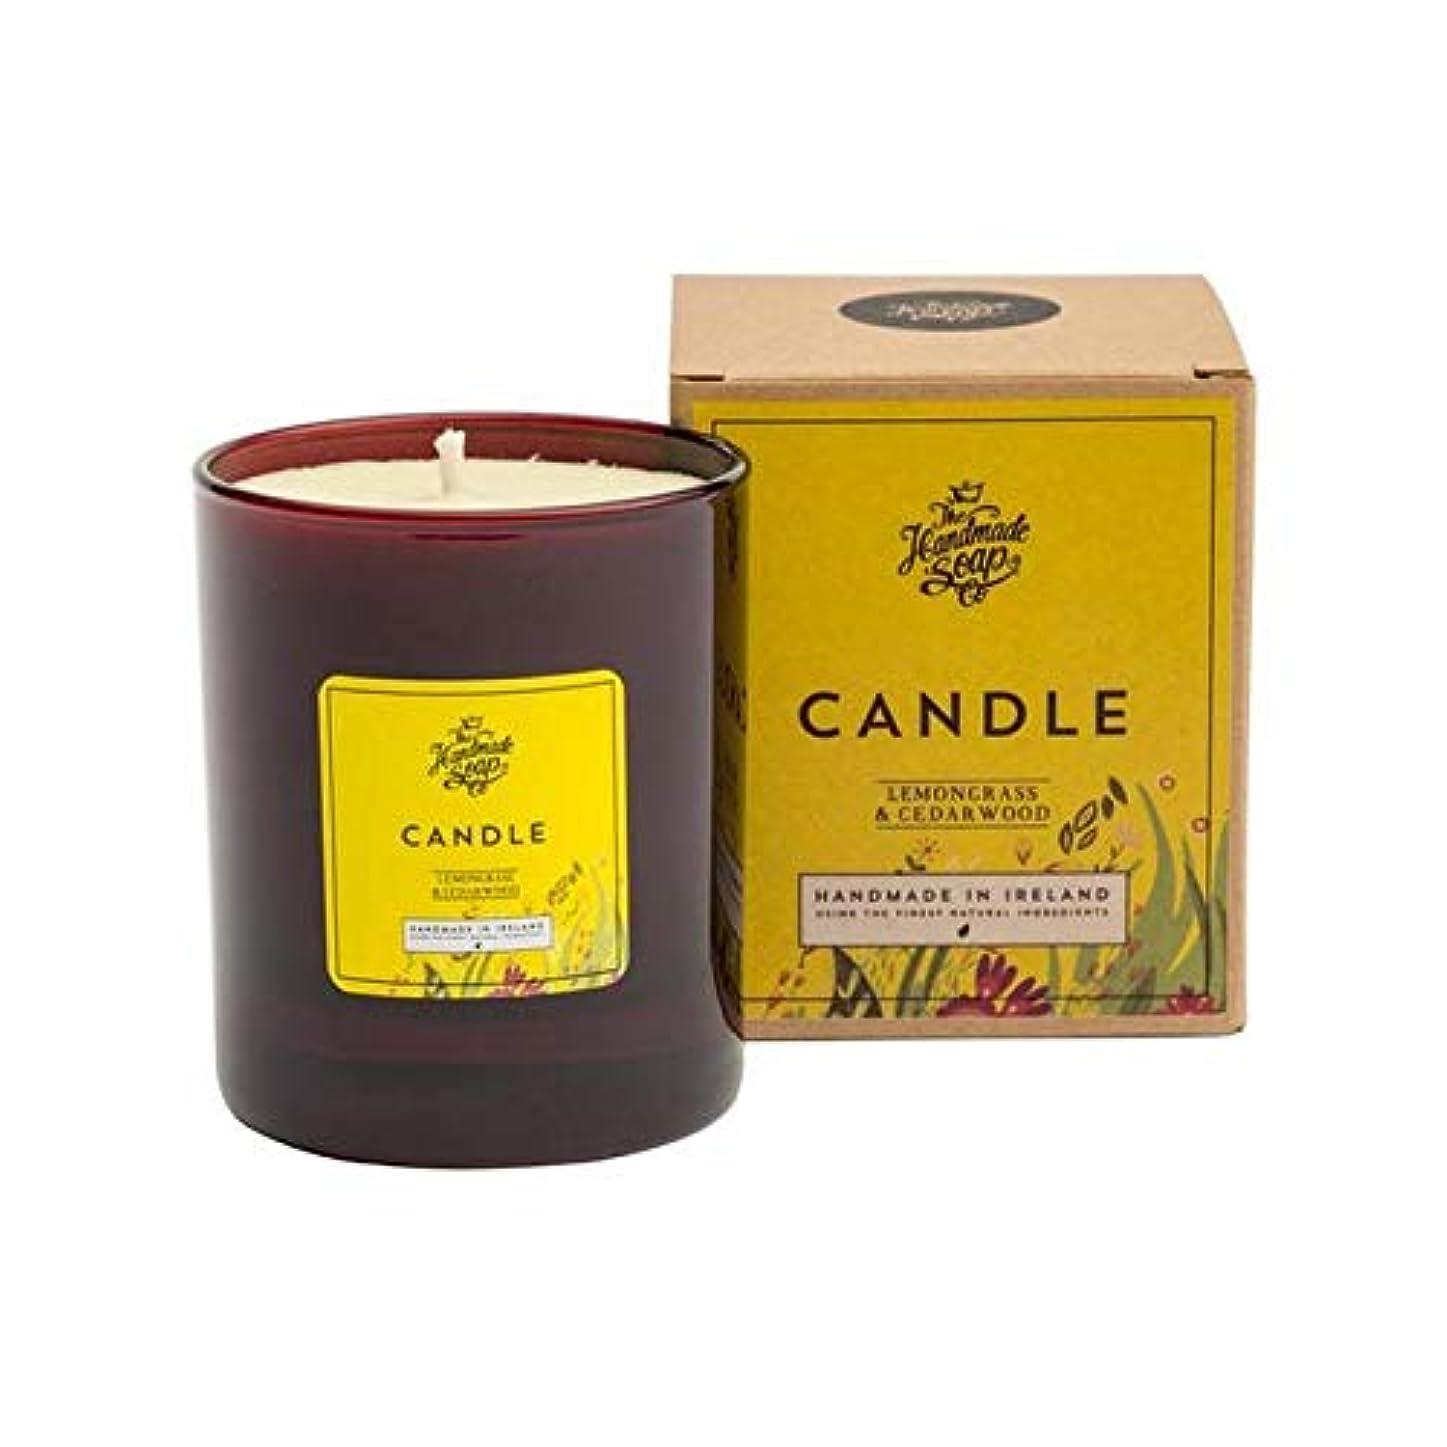 [The Handmade Soap Company ] 手作り石鹸の共同レモングラス&シダーウッドキャンドル180グラム - The Handmade Soap Co Lemongrass & Cedarwood Candle...